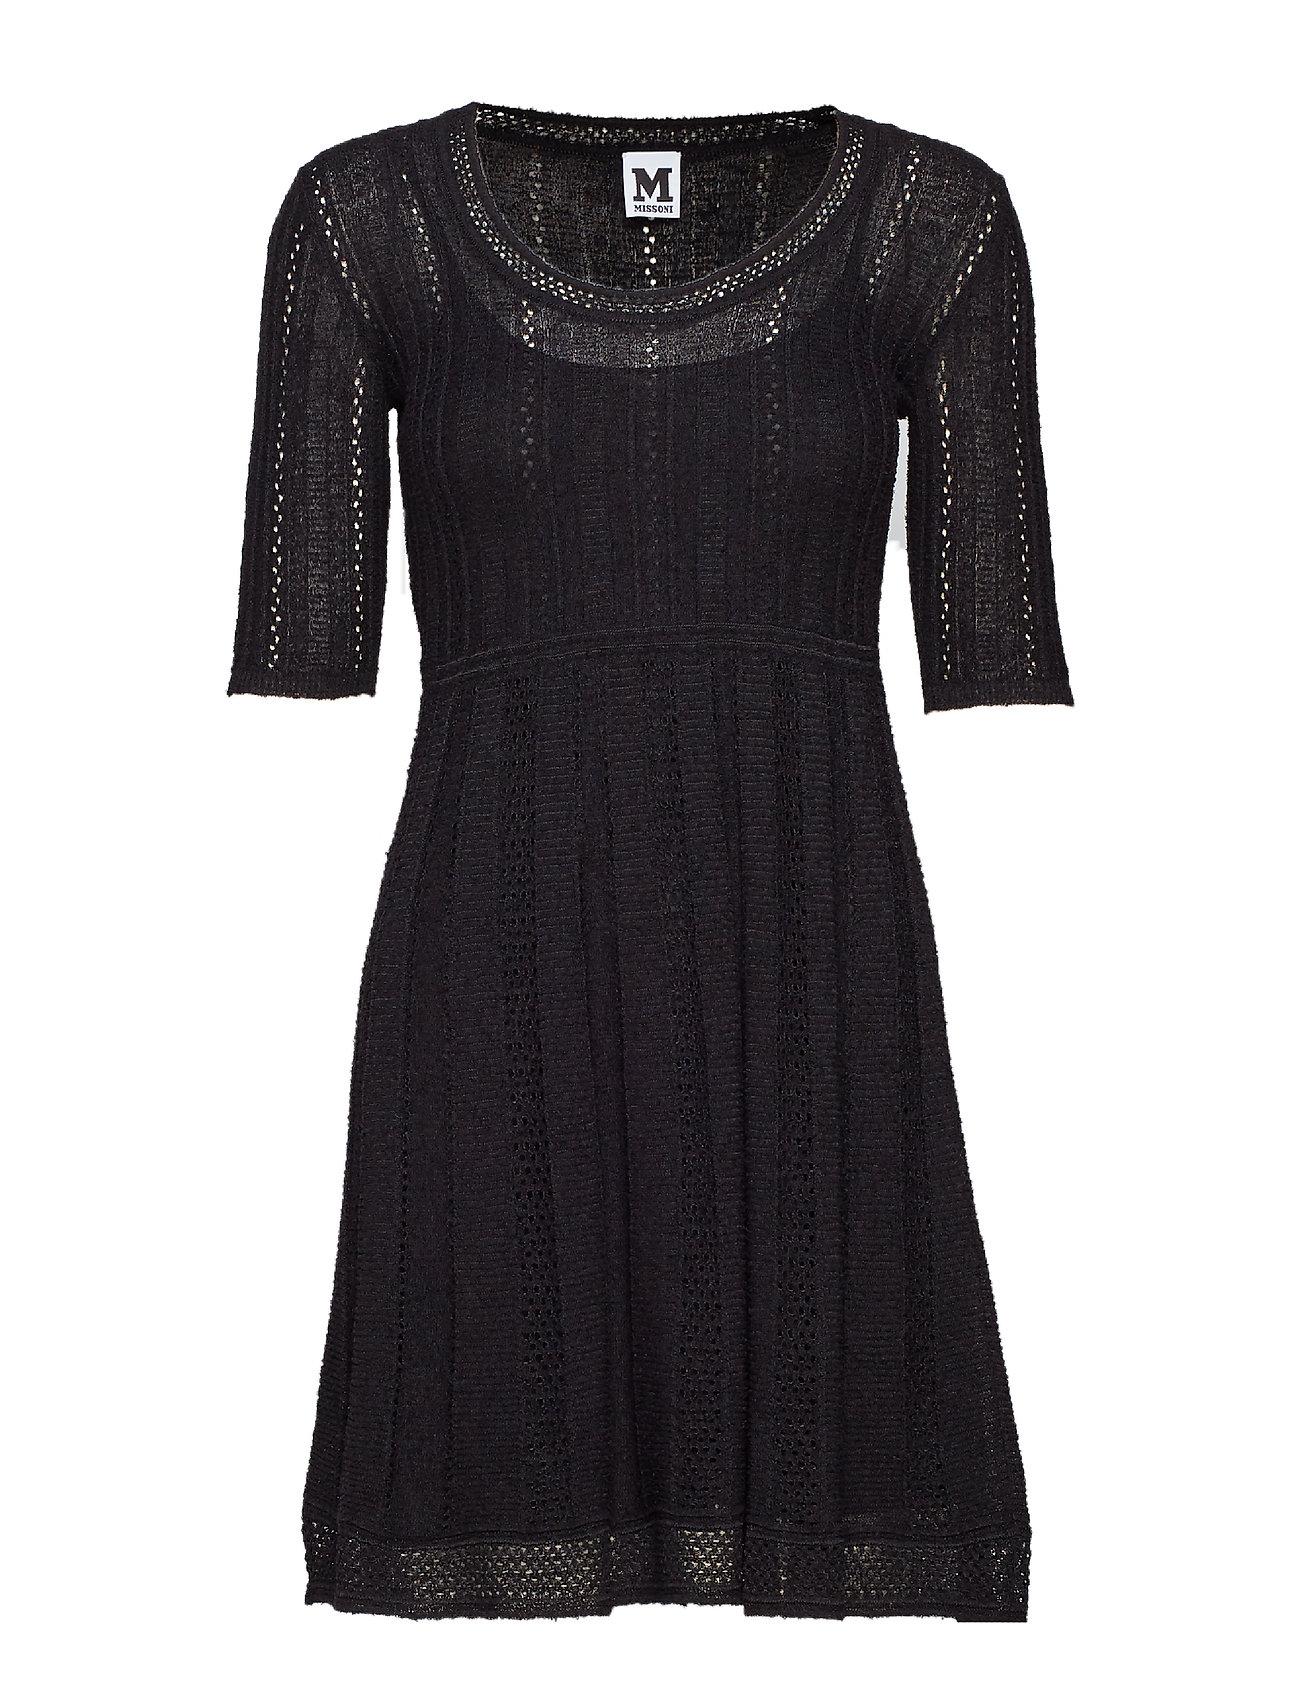 Image of M Missoni-Dress Knælang Kjole Sort M MISSONI (3101136145)